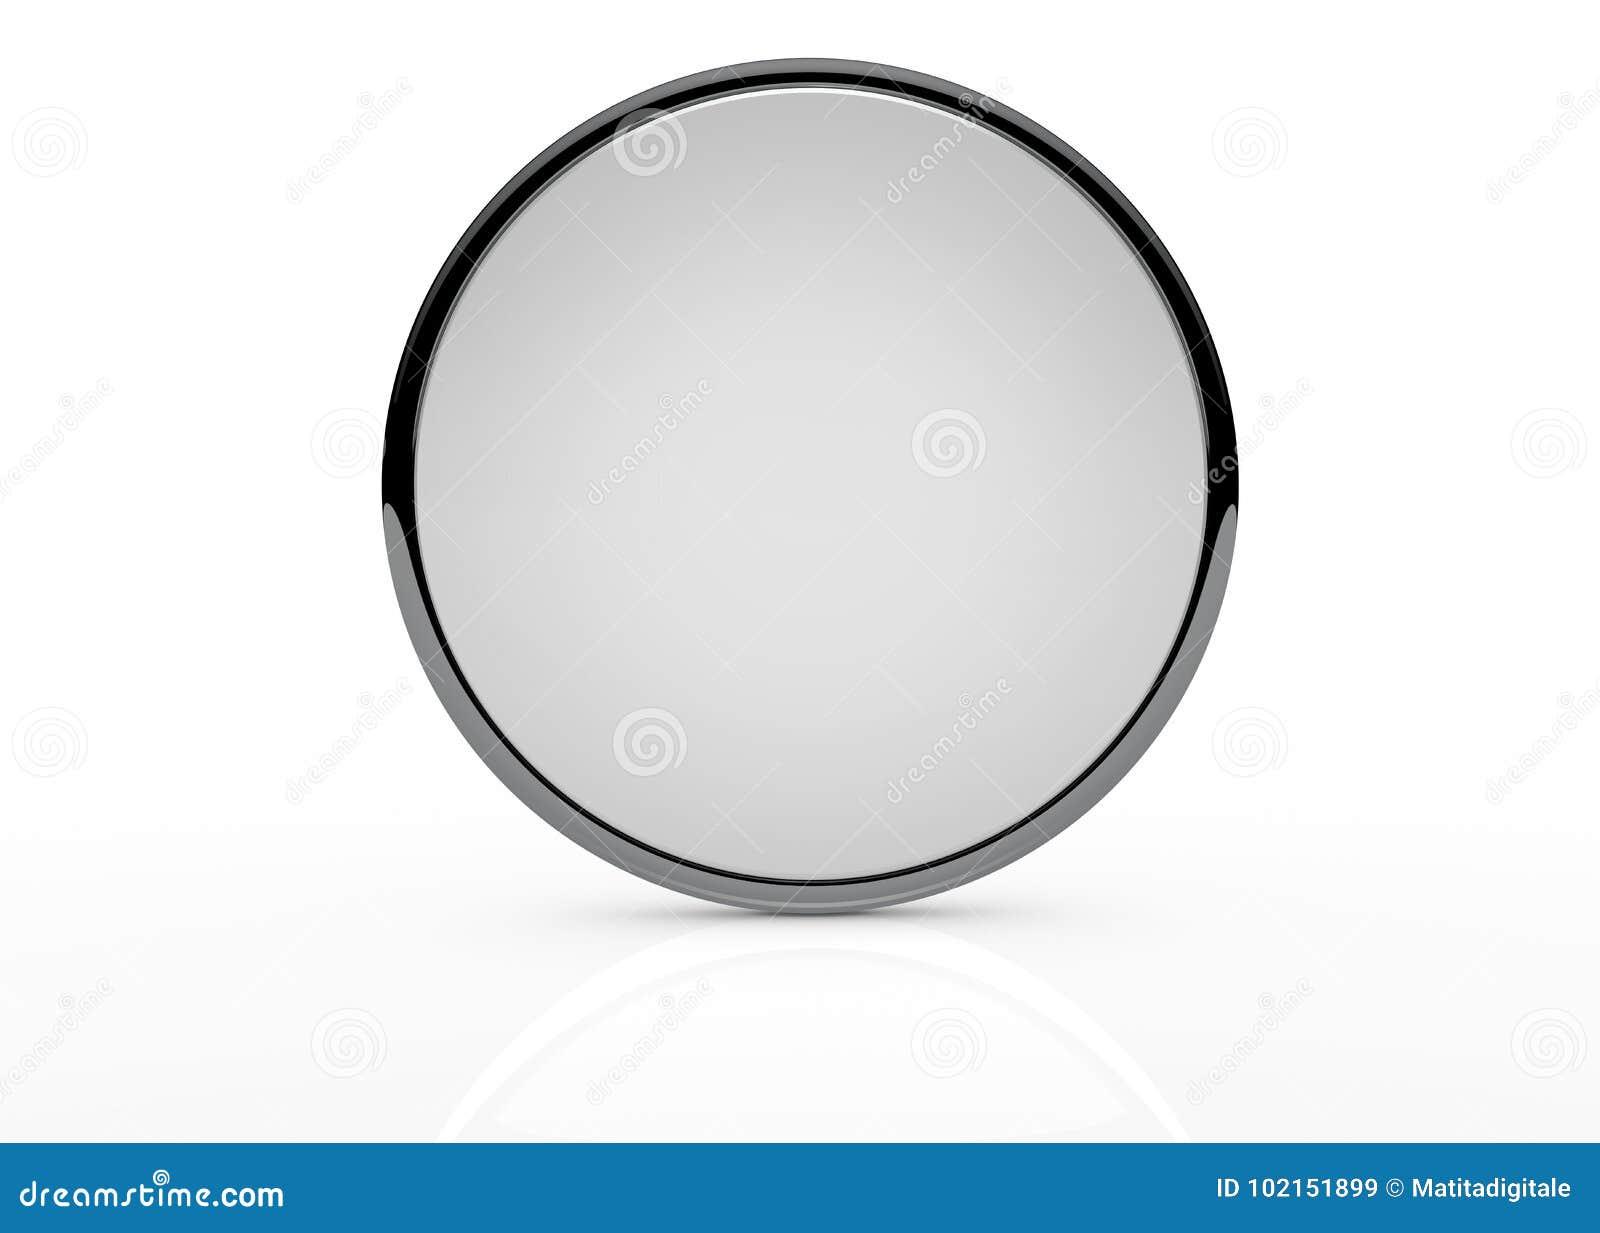 mirror stock illustration illustration of circular 102151899